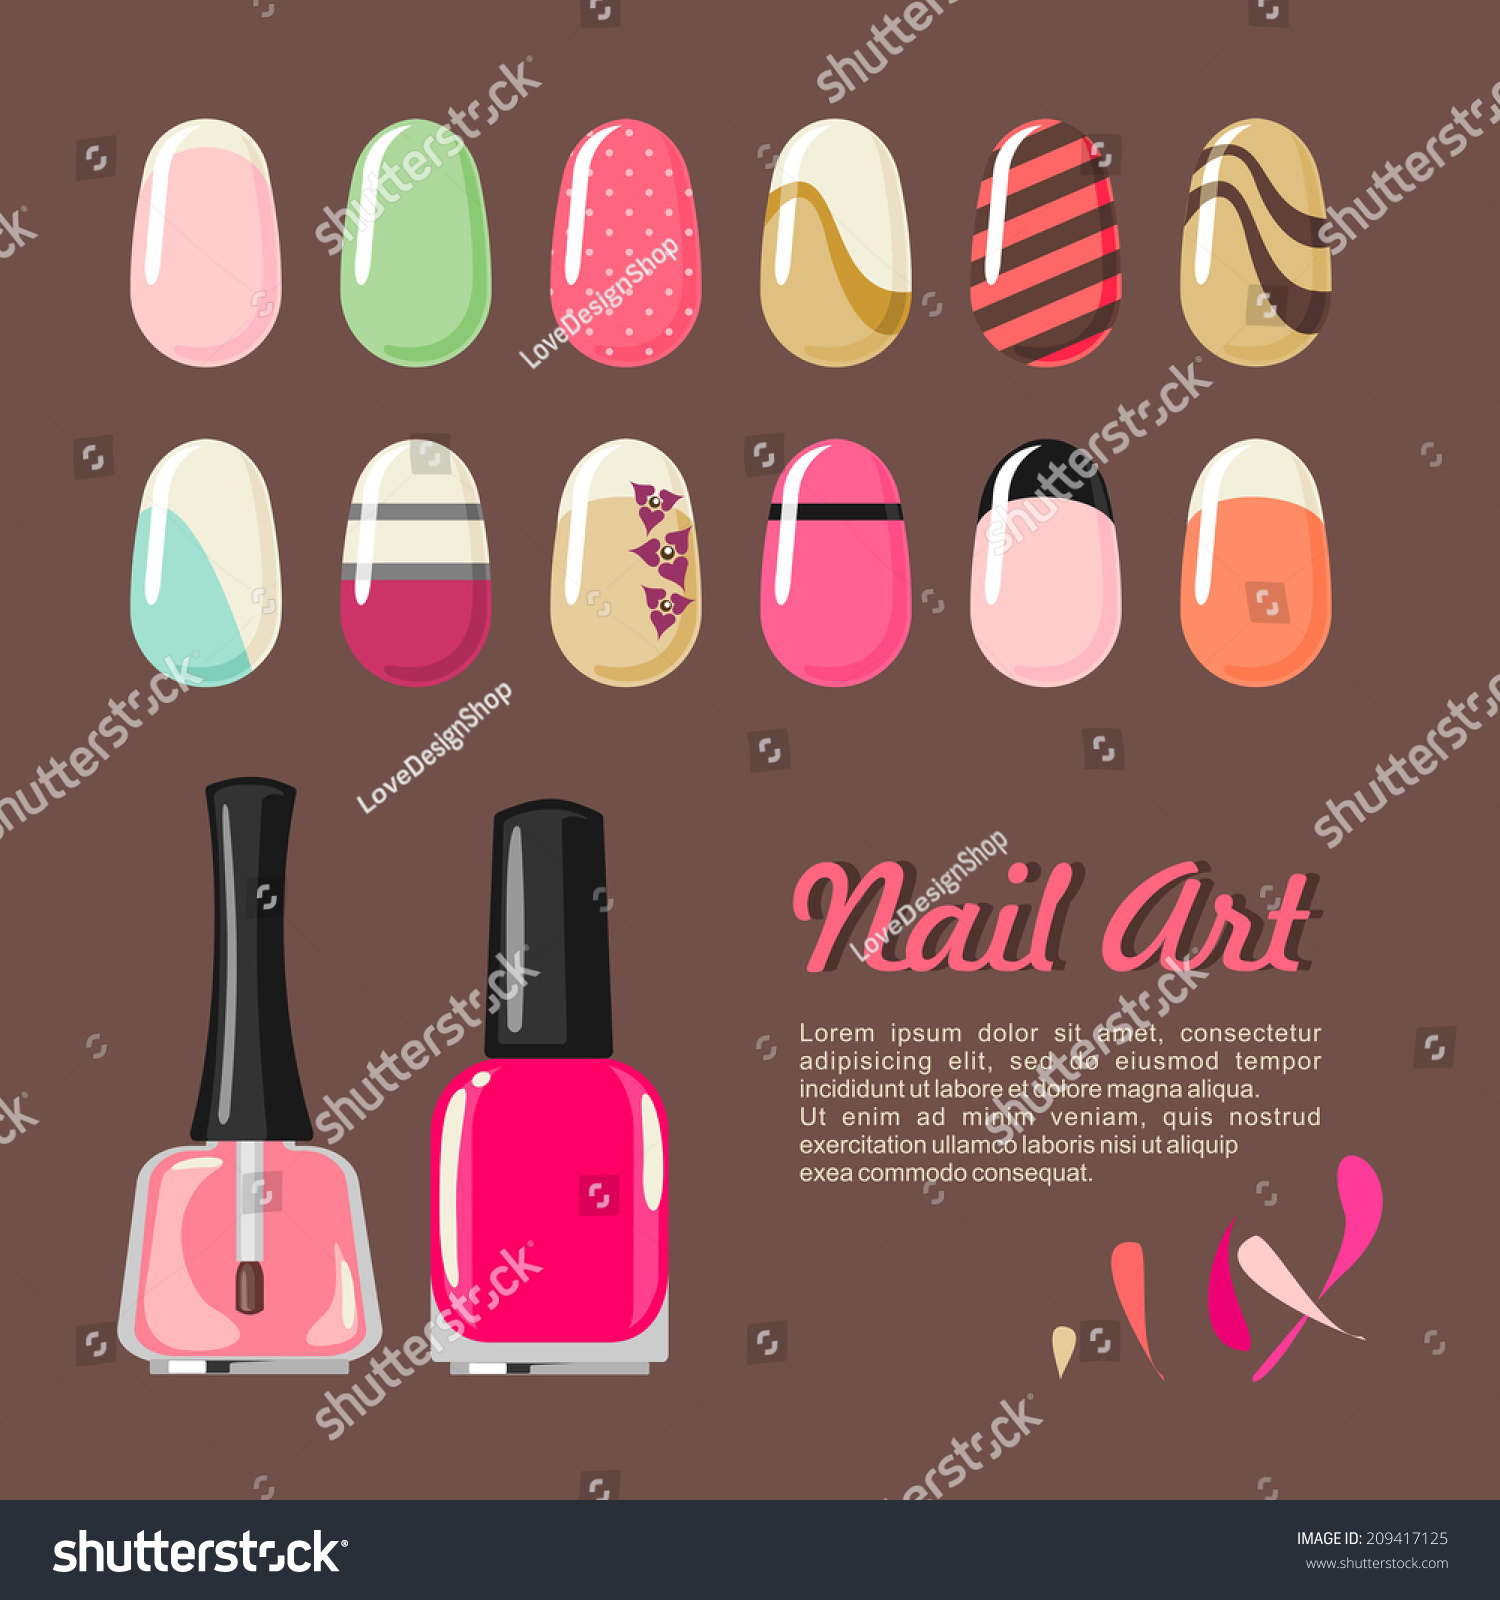 Nail Art Vector: Nails Art Templates Polish Bottle Manicure Stock Vector